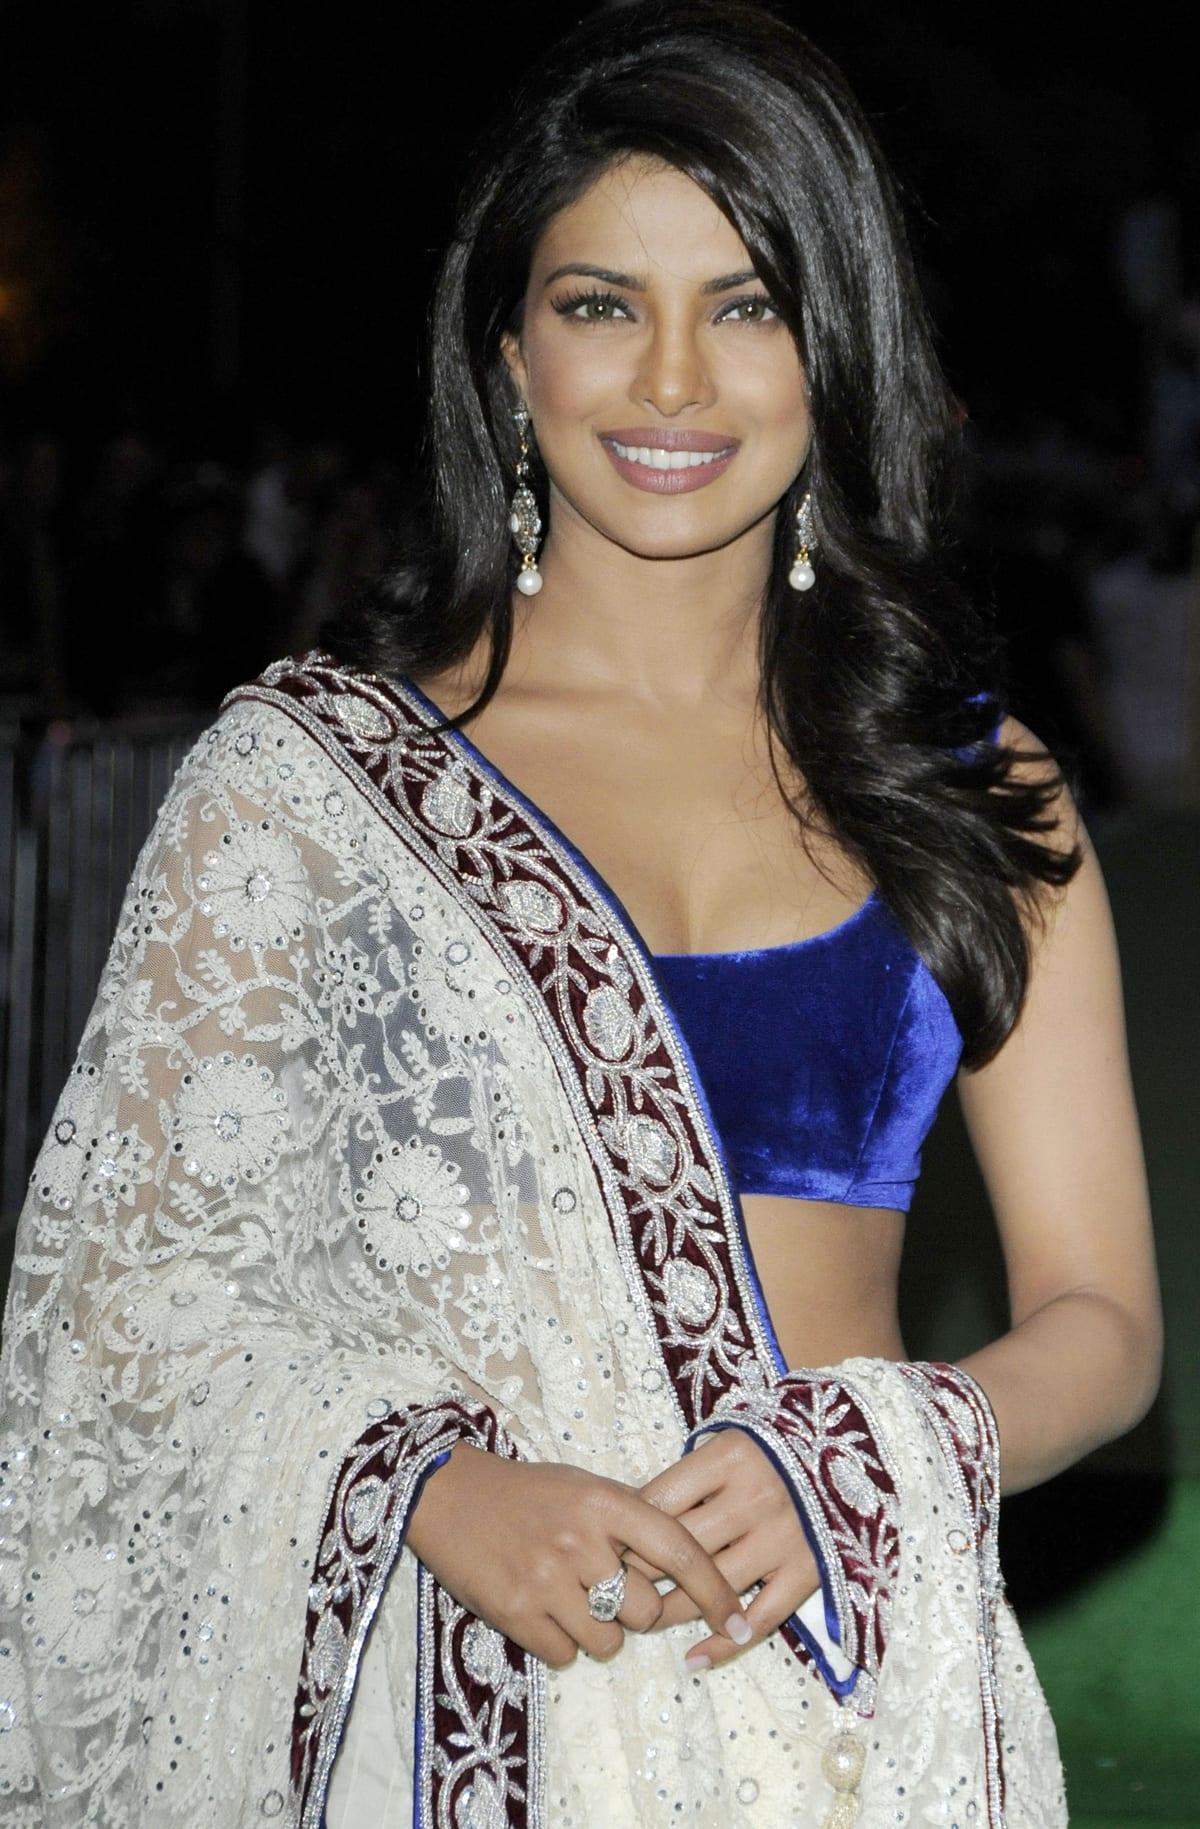 Priyanka Chopra paired a white lehenga with a blue velvet choli